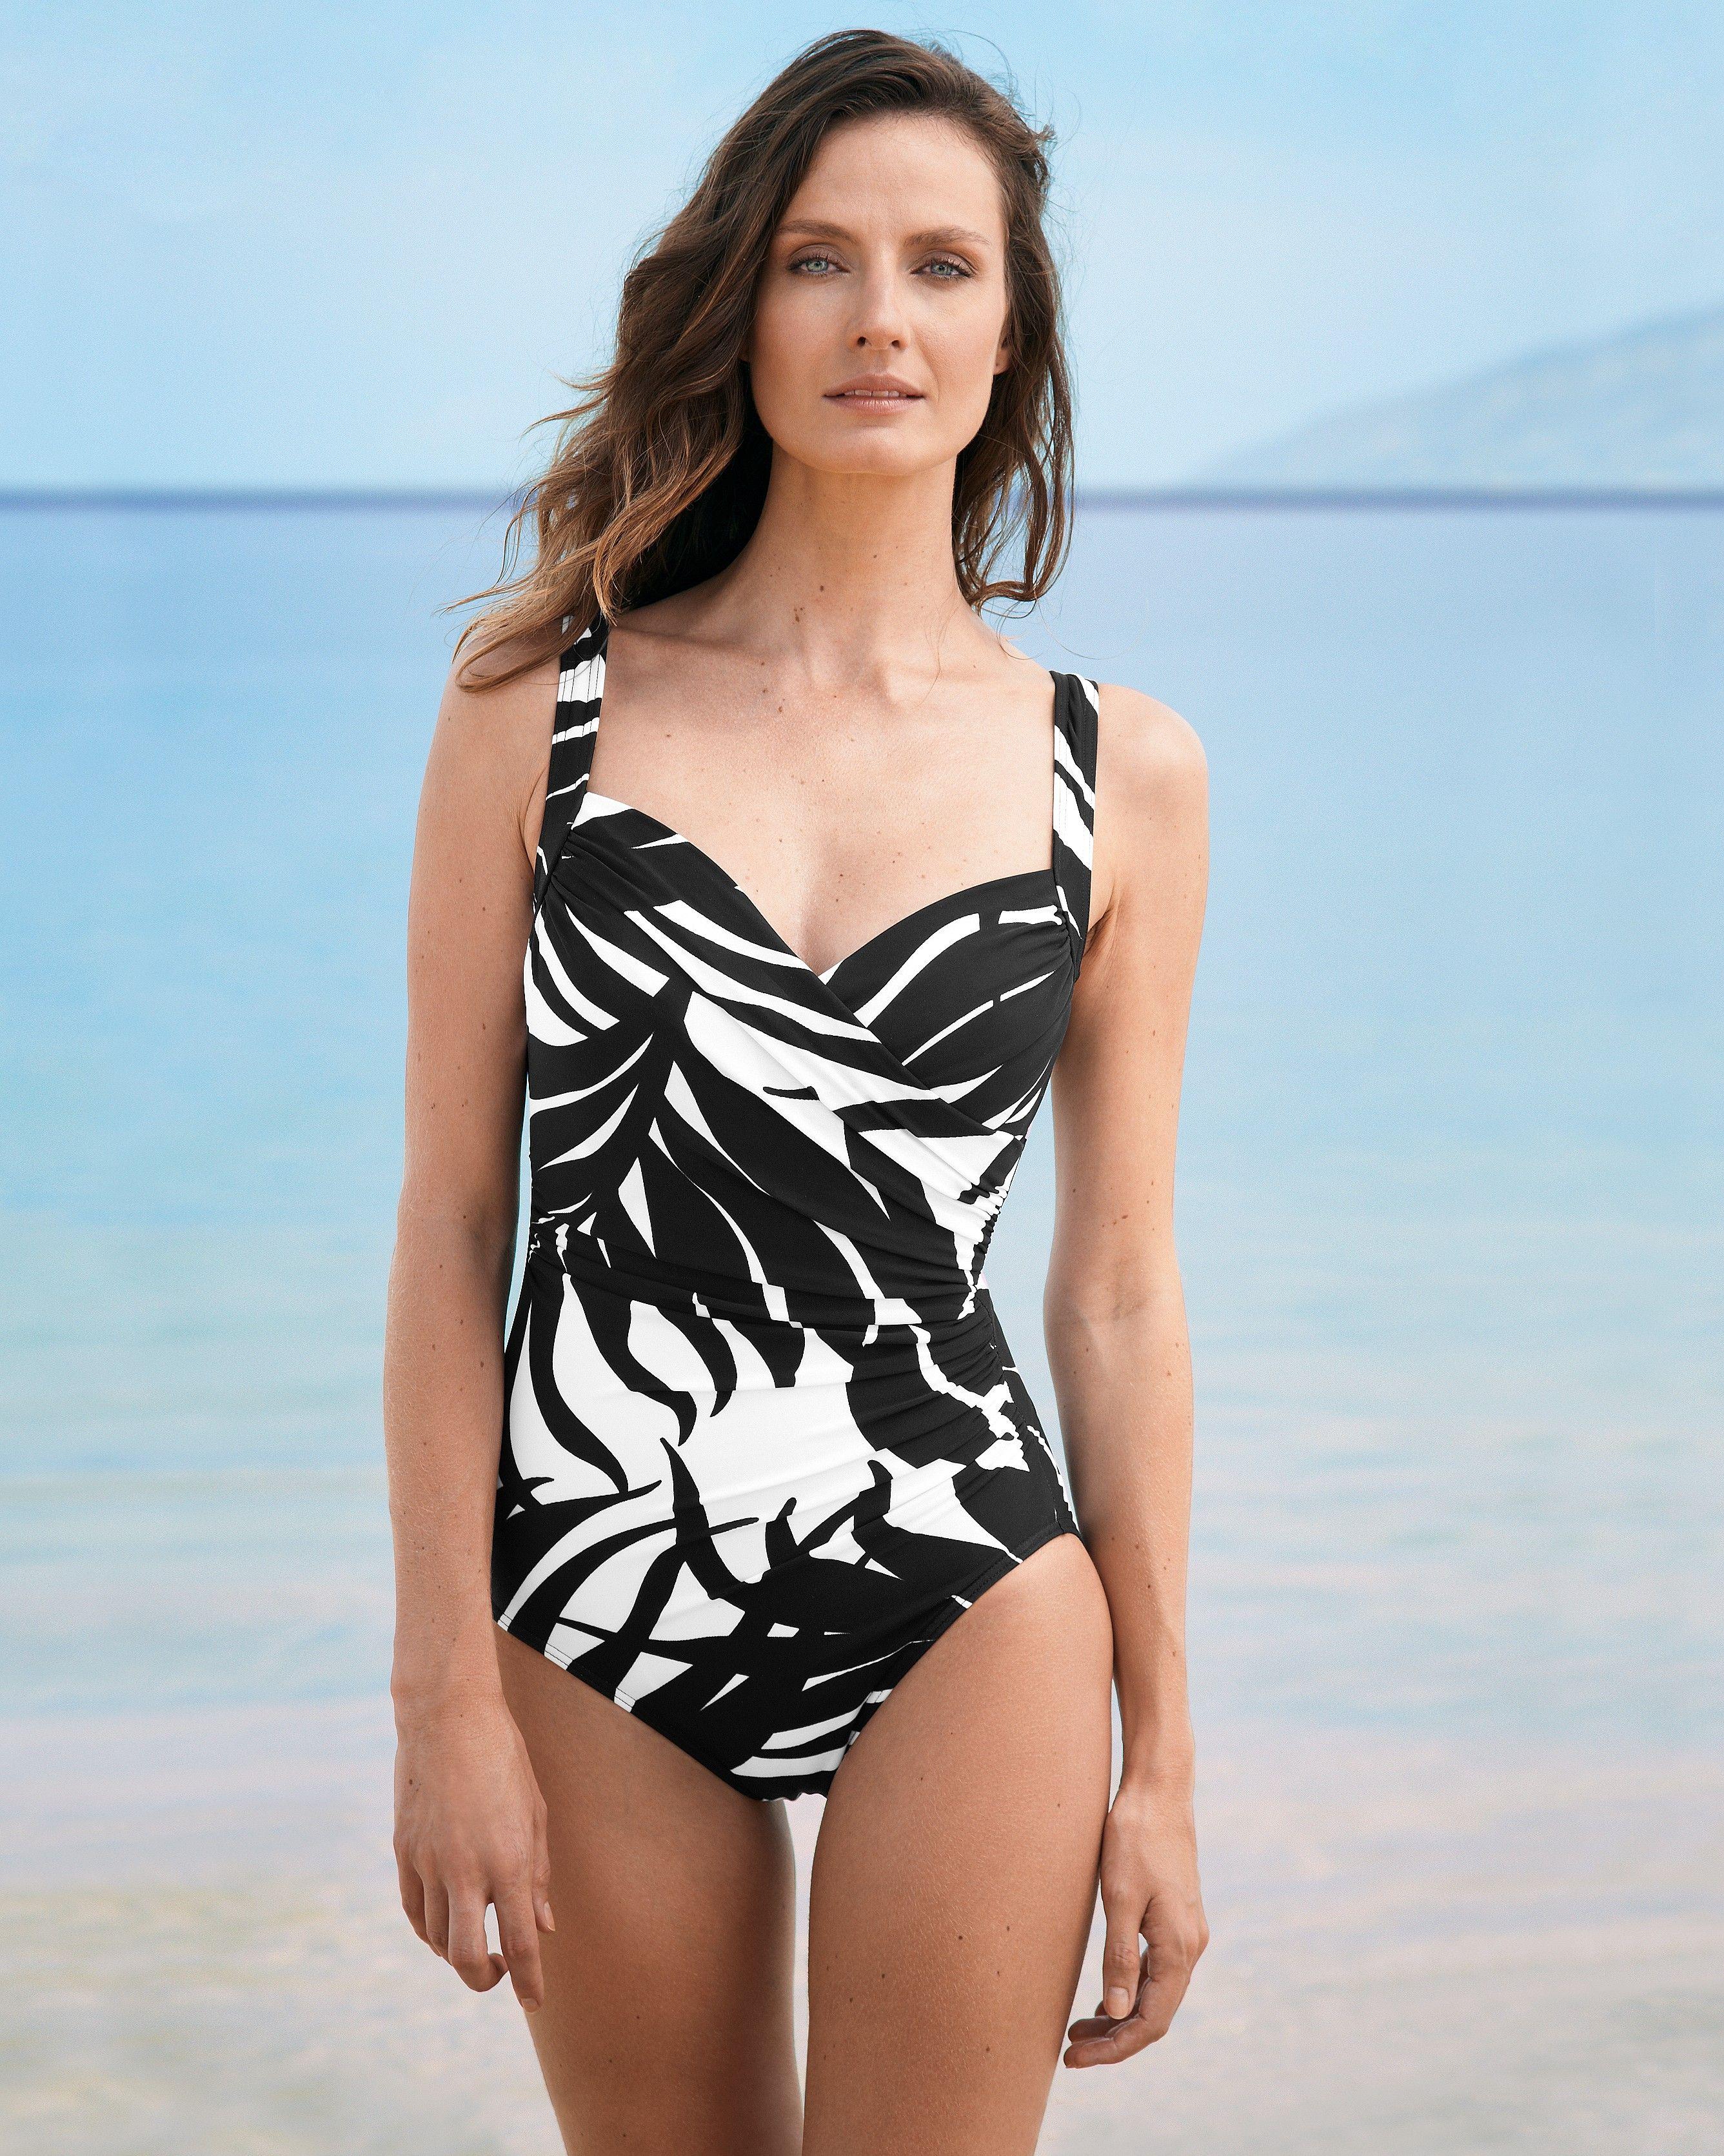 930b7b66575 Miraclesuit® Sanibel One-Piece Swimsuit - Black & White Print   Eddie Bauer